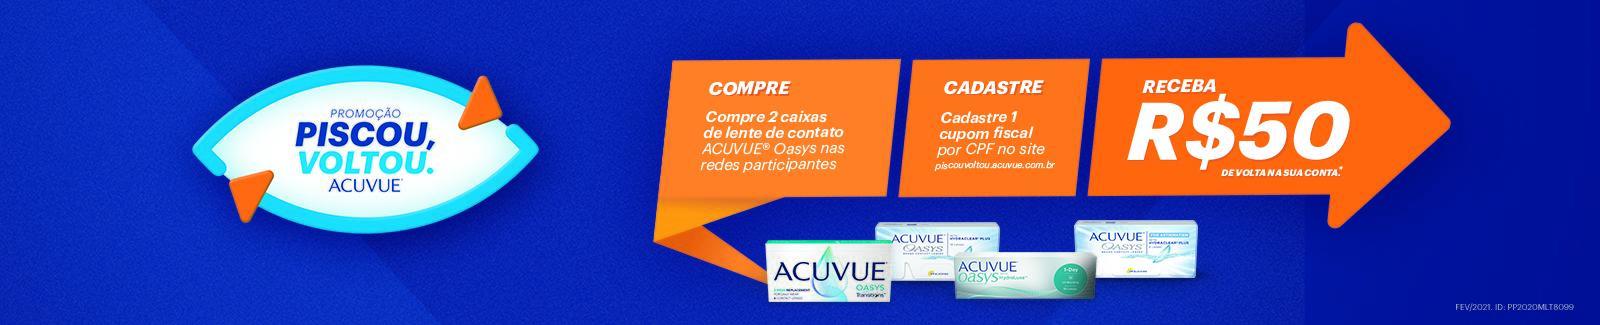 Acuvue Cashback